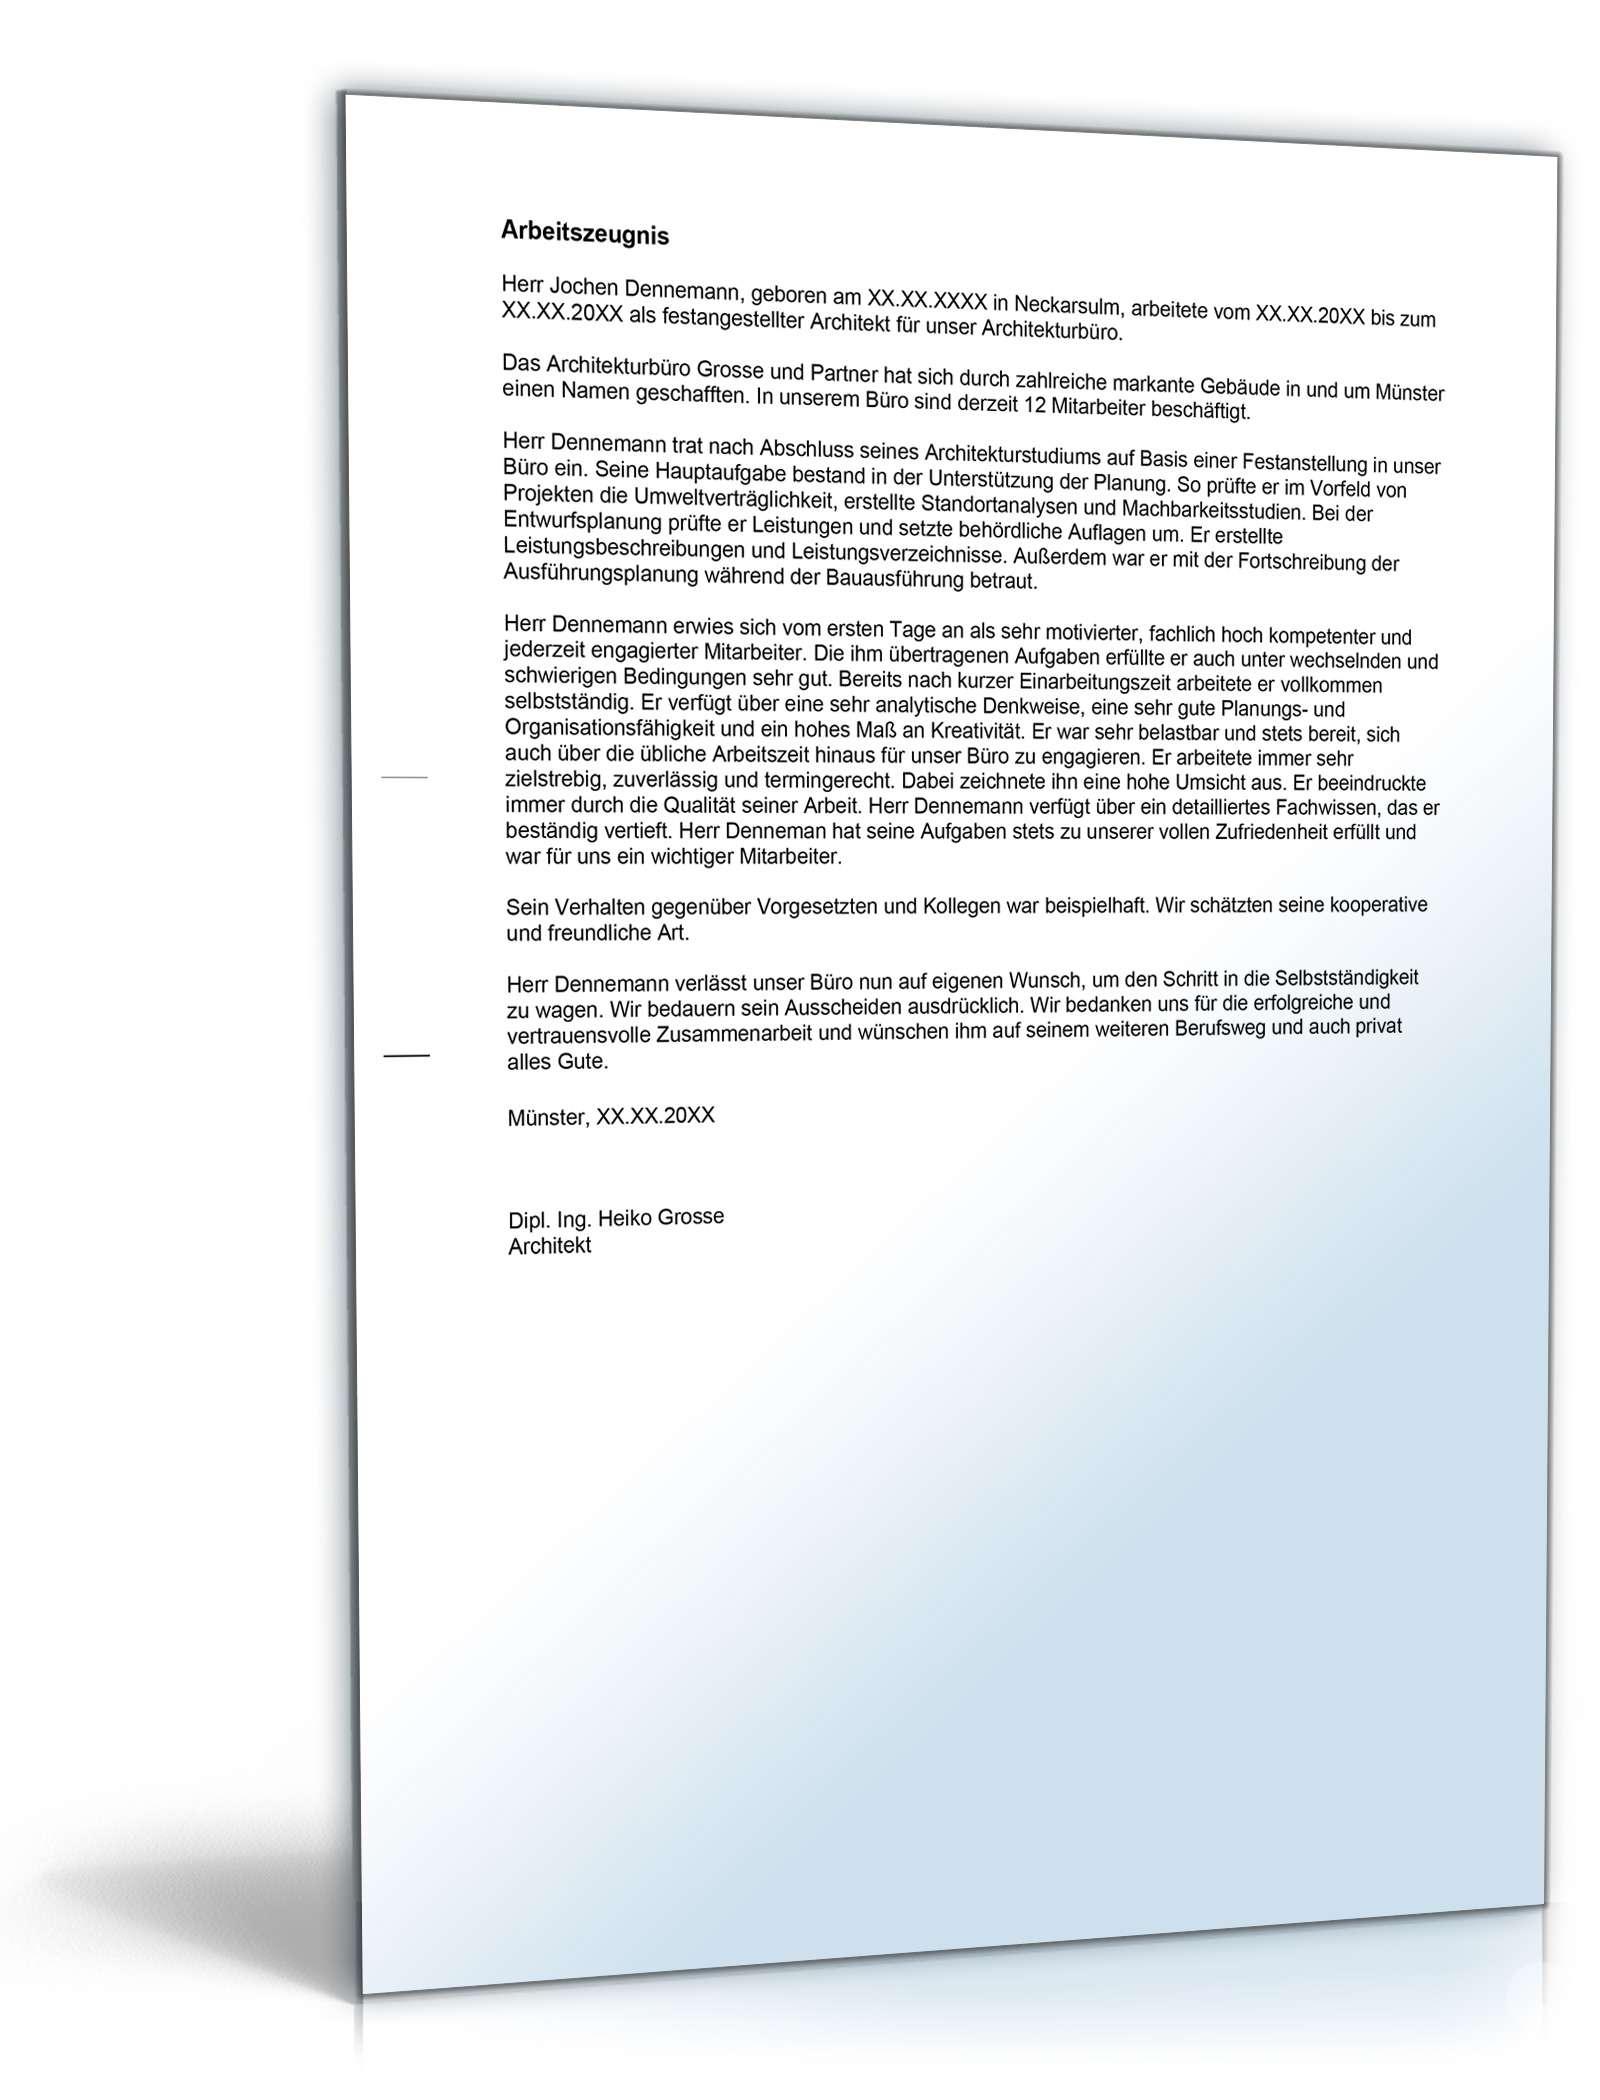 Niedlich Architekt Lebenslauf Vorlage Bilder - Entry Level Resume ...